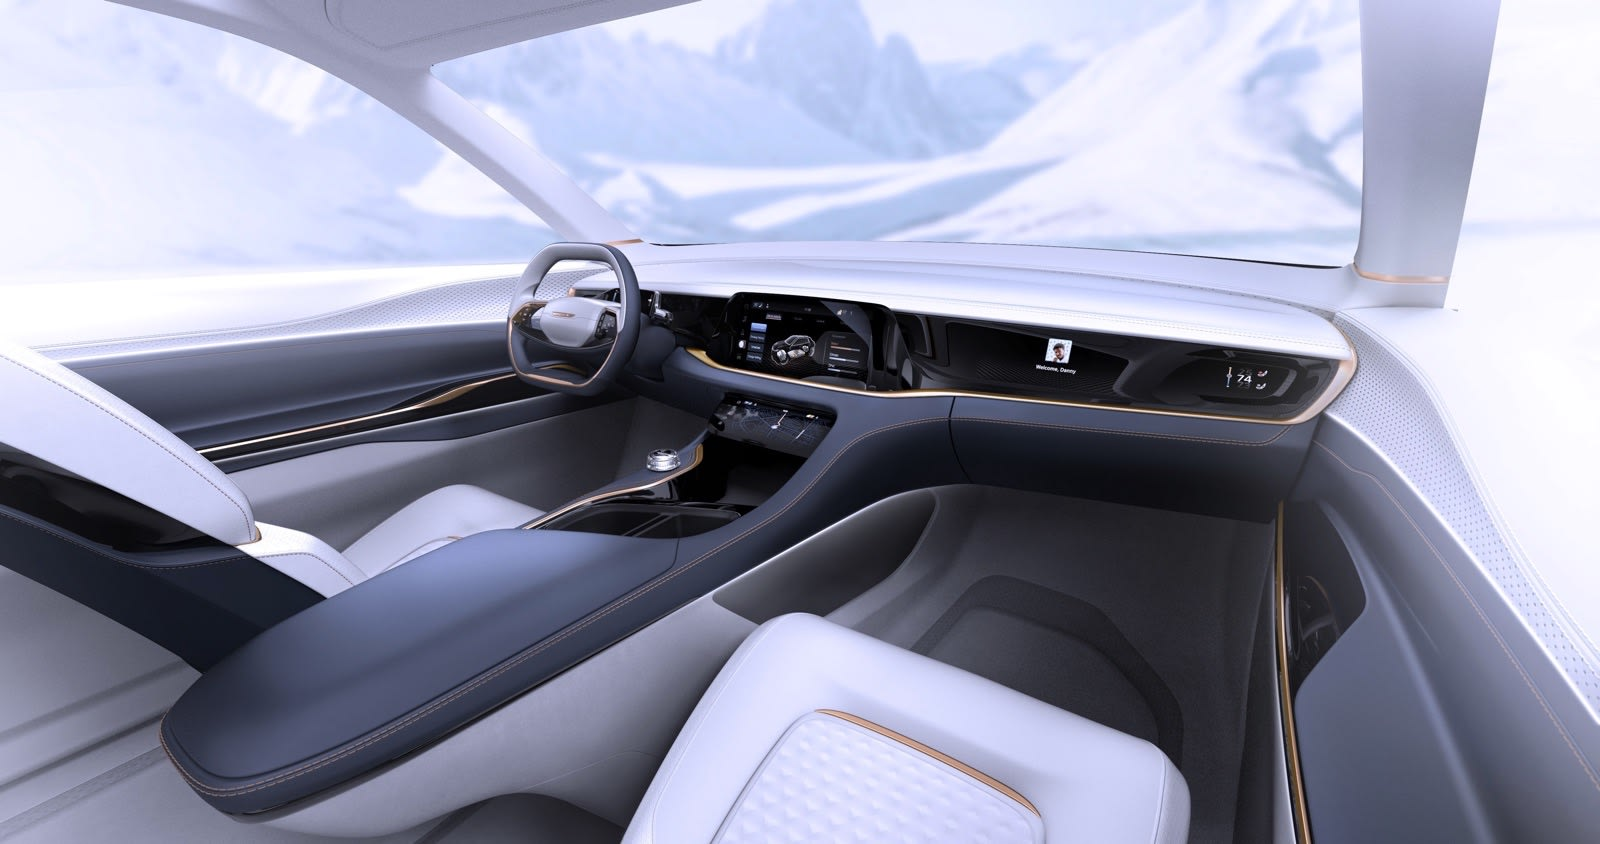 Fiat Chrysler Airflow Vision concept car interior